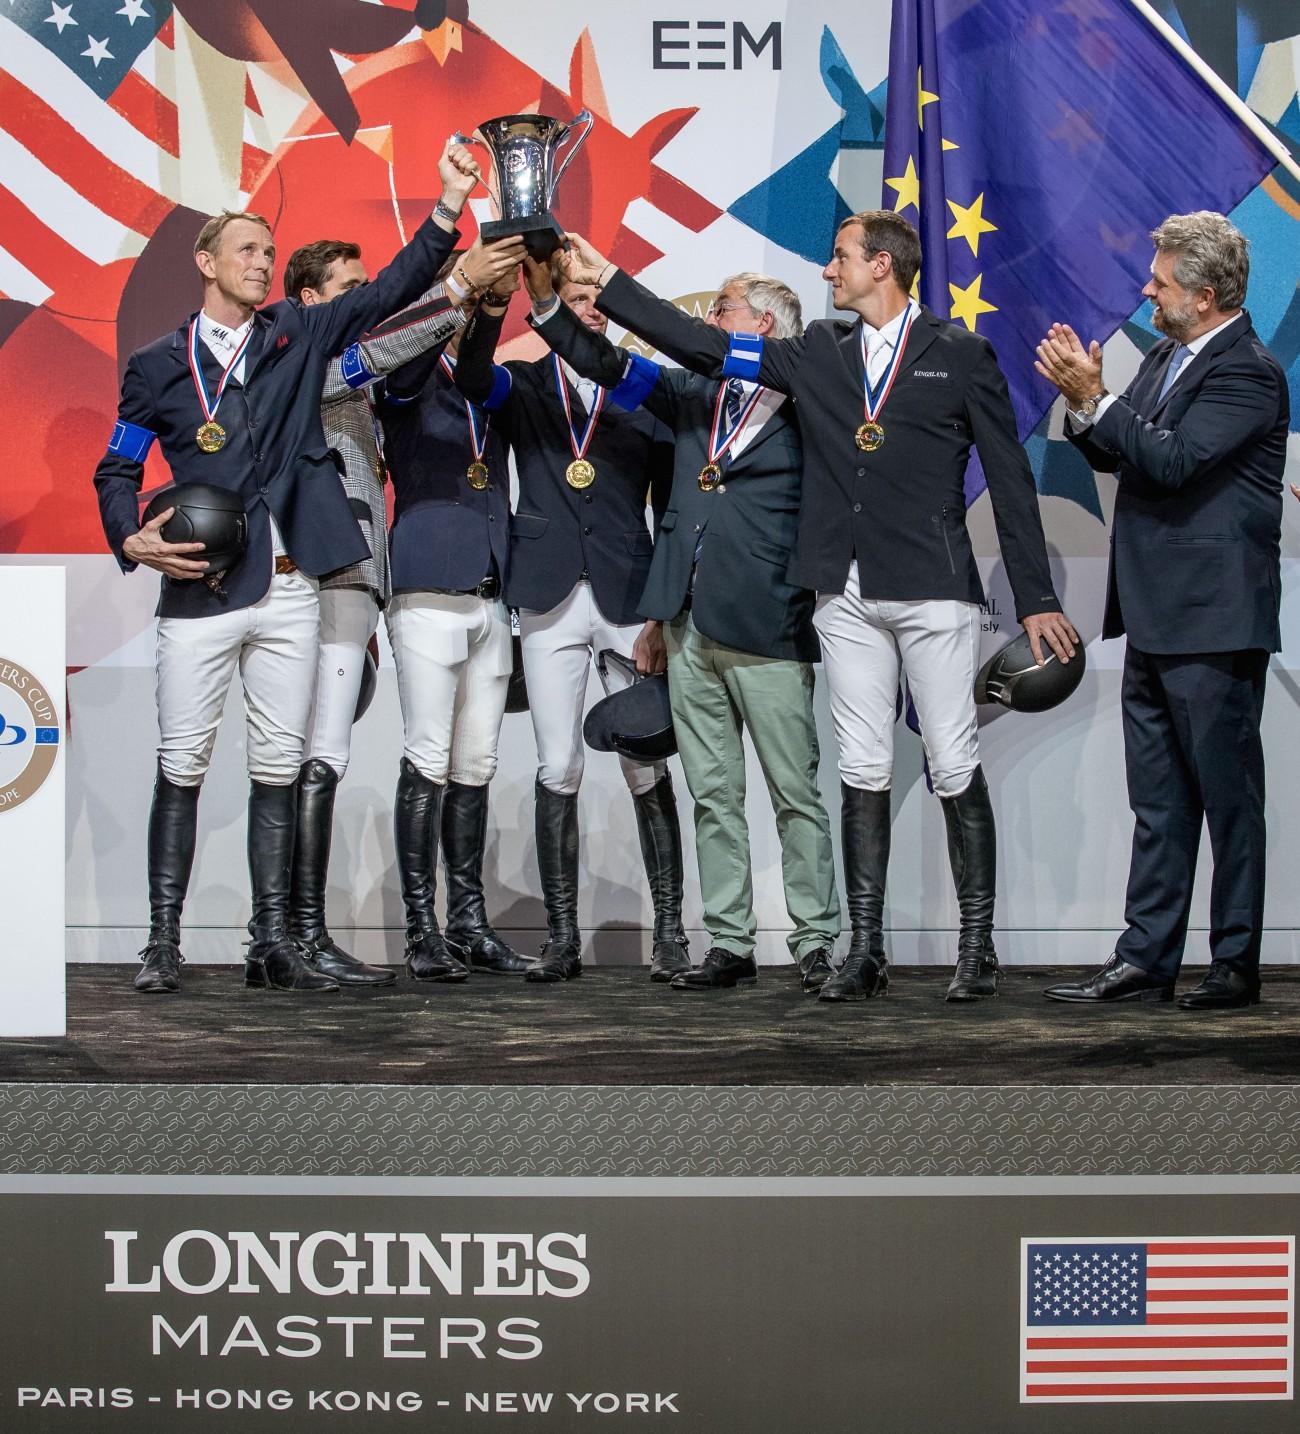 2018.04.28.99.99 Longines Masters NY CSI 5 Saturday Team Europe J. Rodrigues Jfx 3.jpg